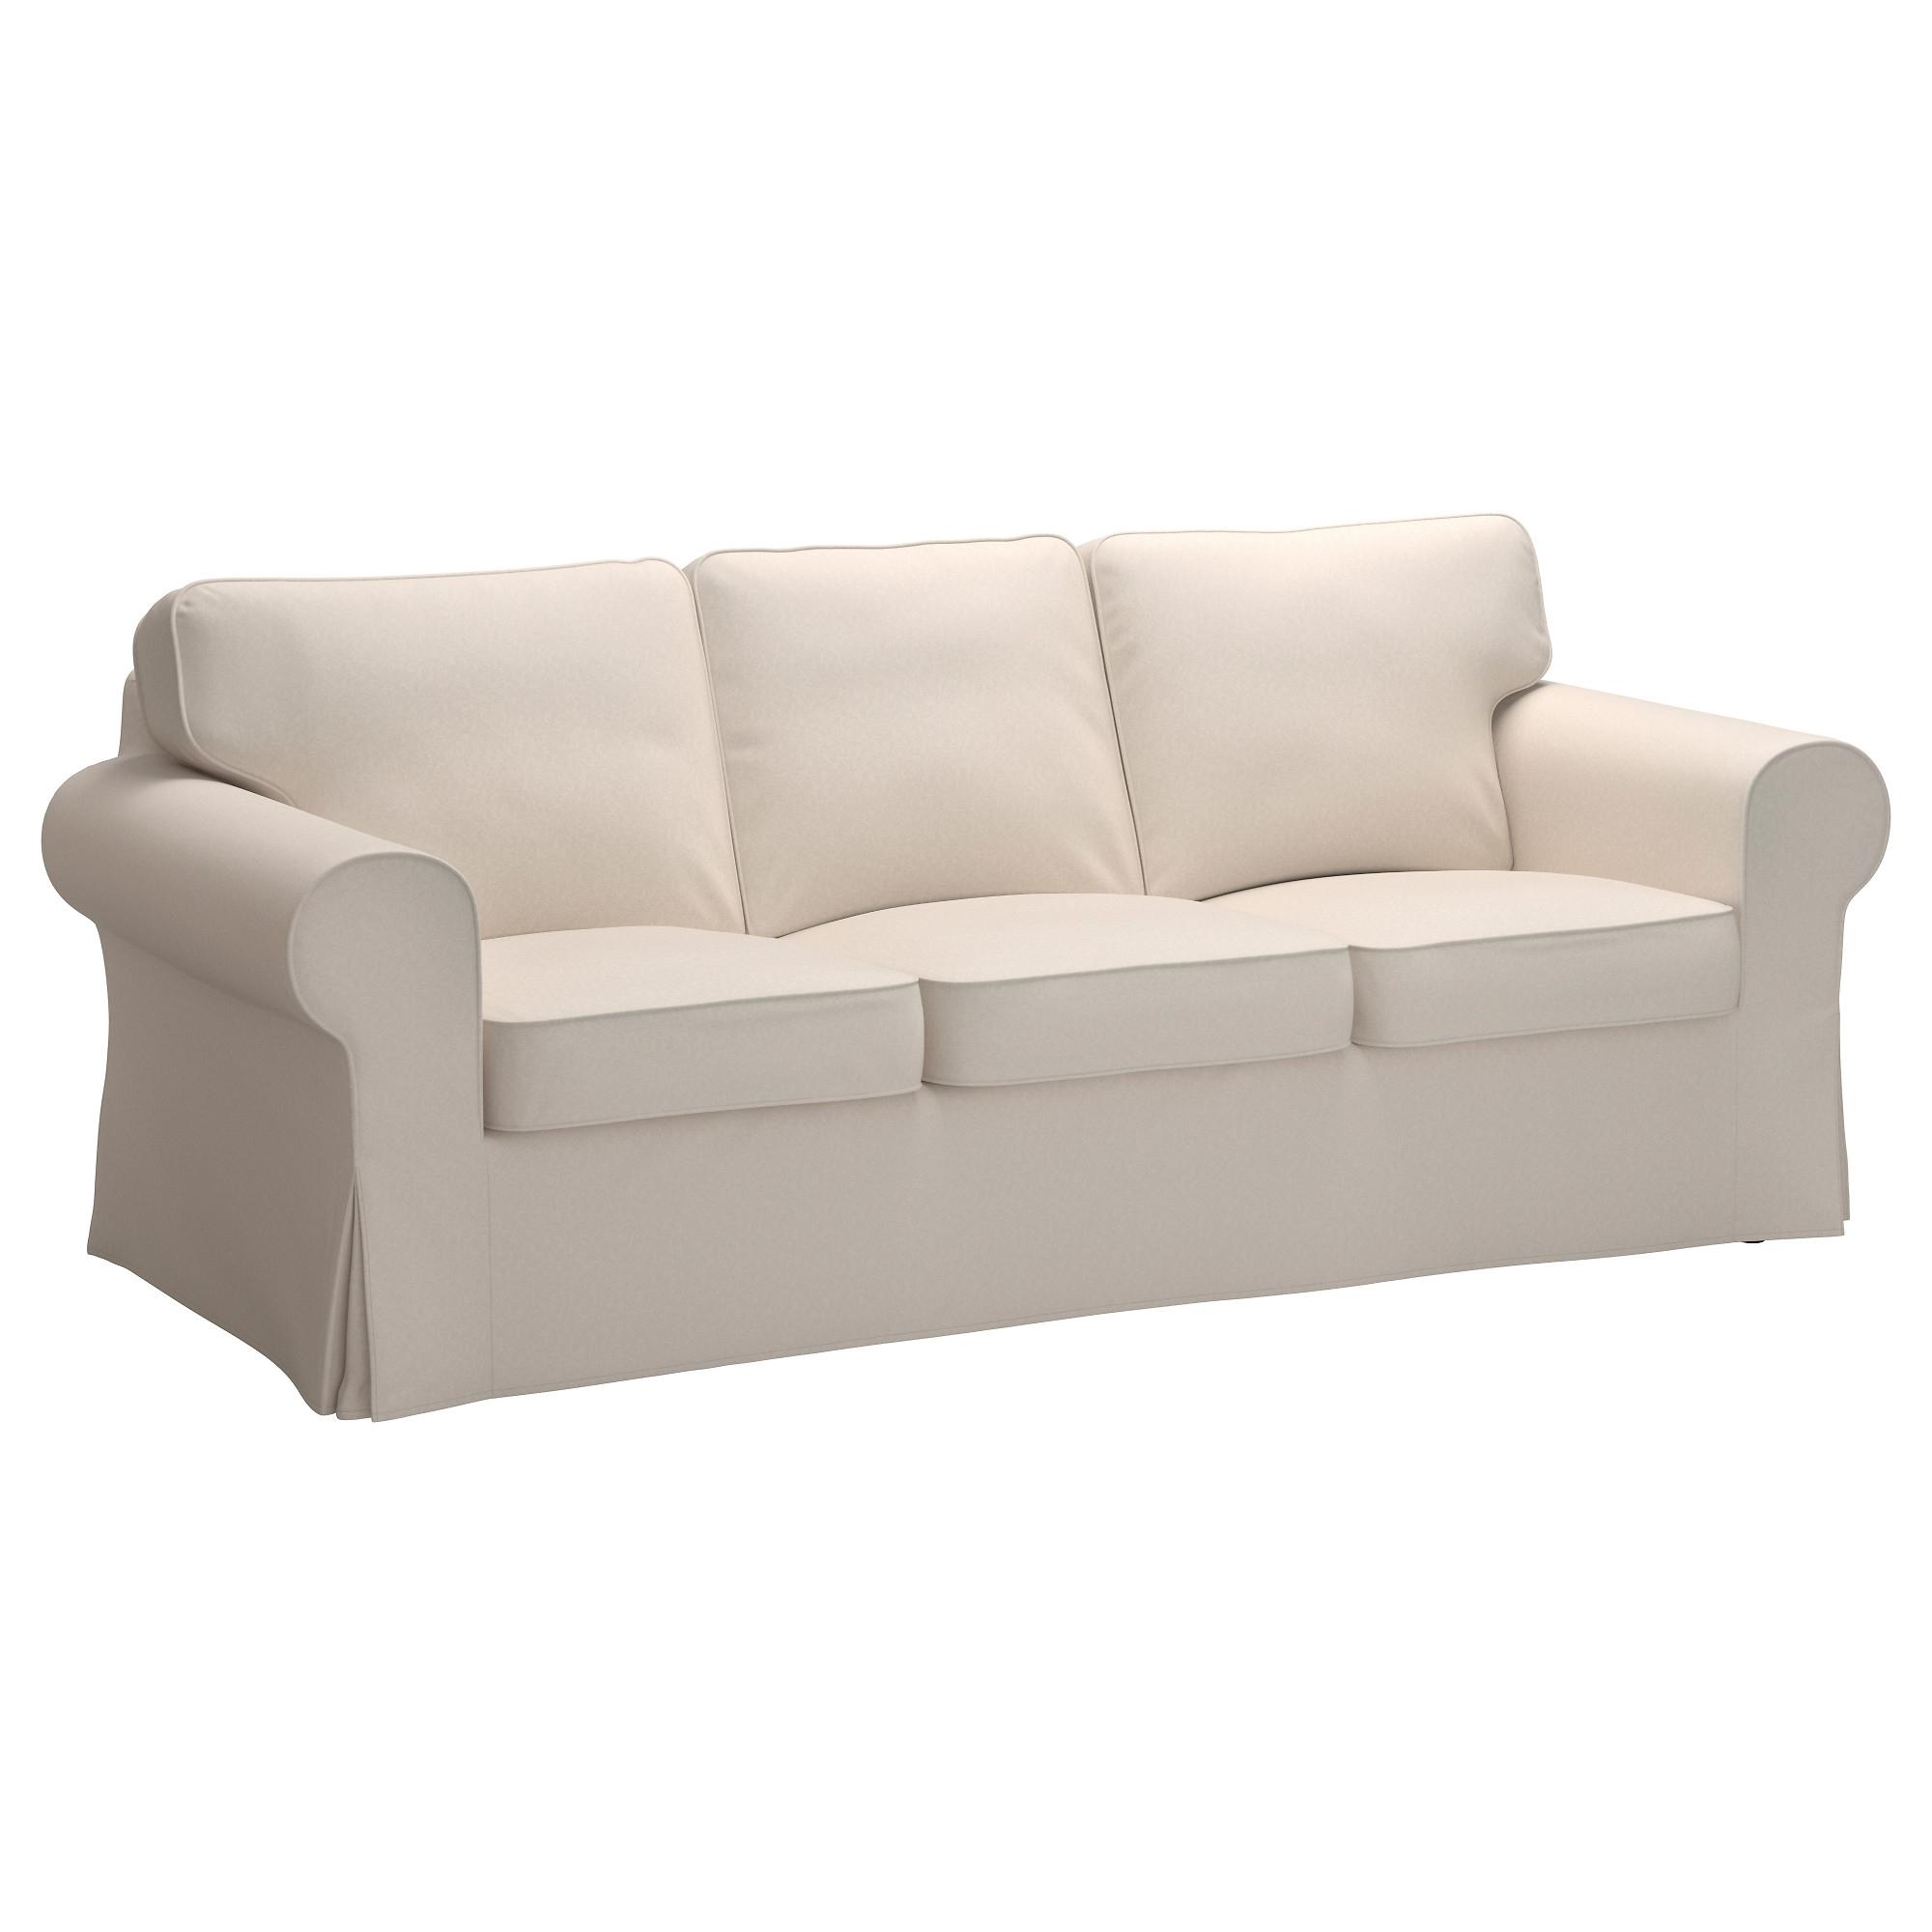 Favorite Ikea Small Sofas Inside Ektorp Three Seat Sofa – Lofallet Beige – Ikea (View 4 of 15)